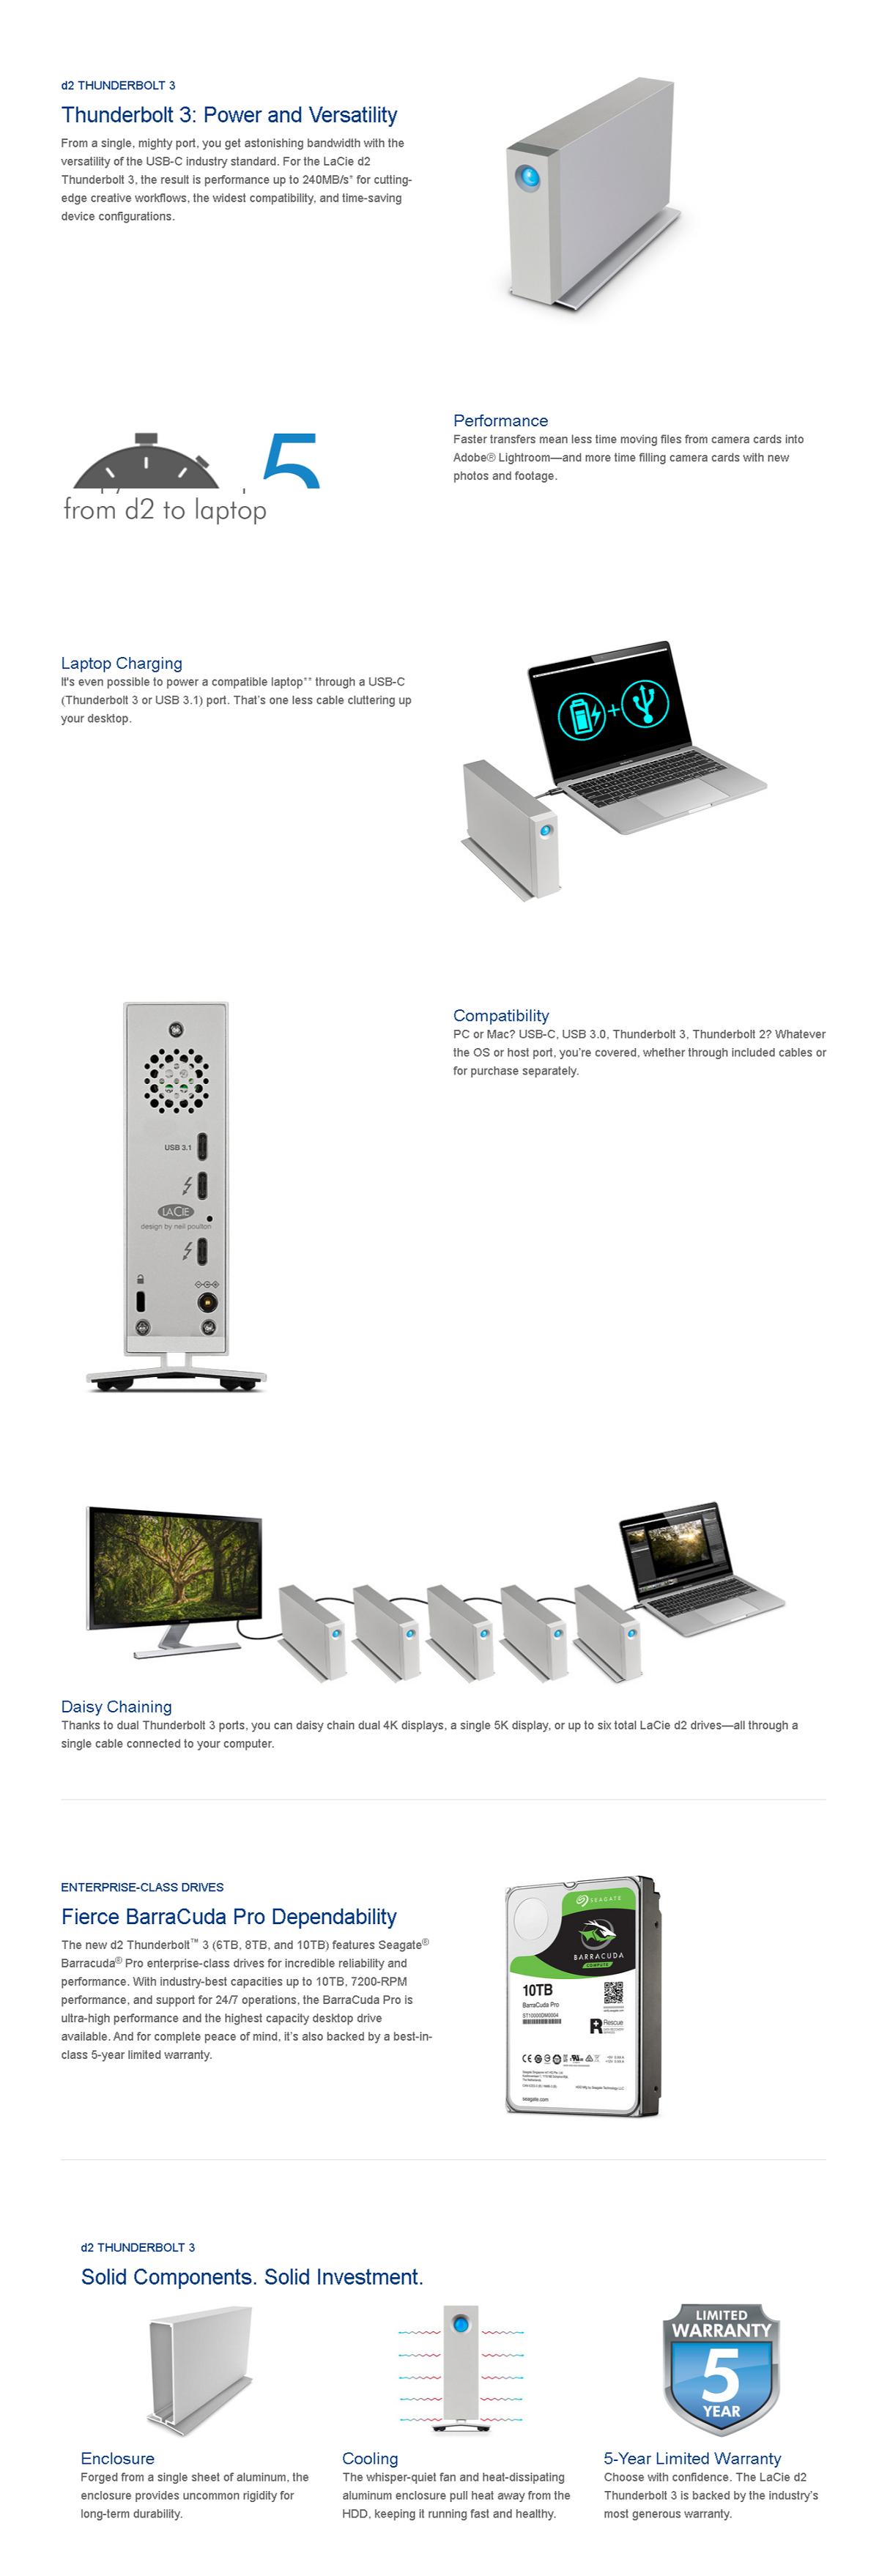 LaCie 6TB d2 Thunderbolt3 USB-C Desktop Drive